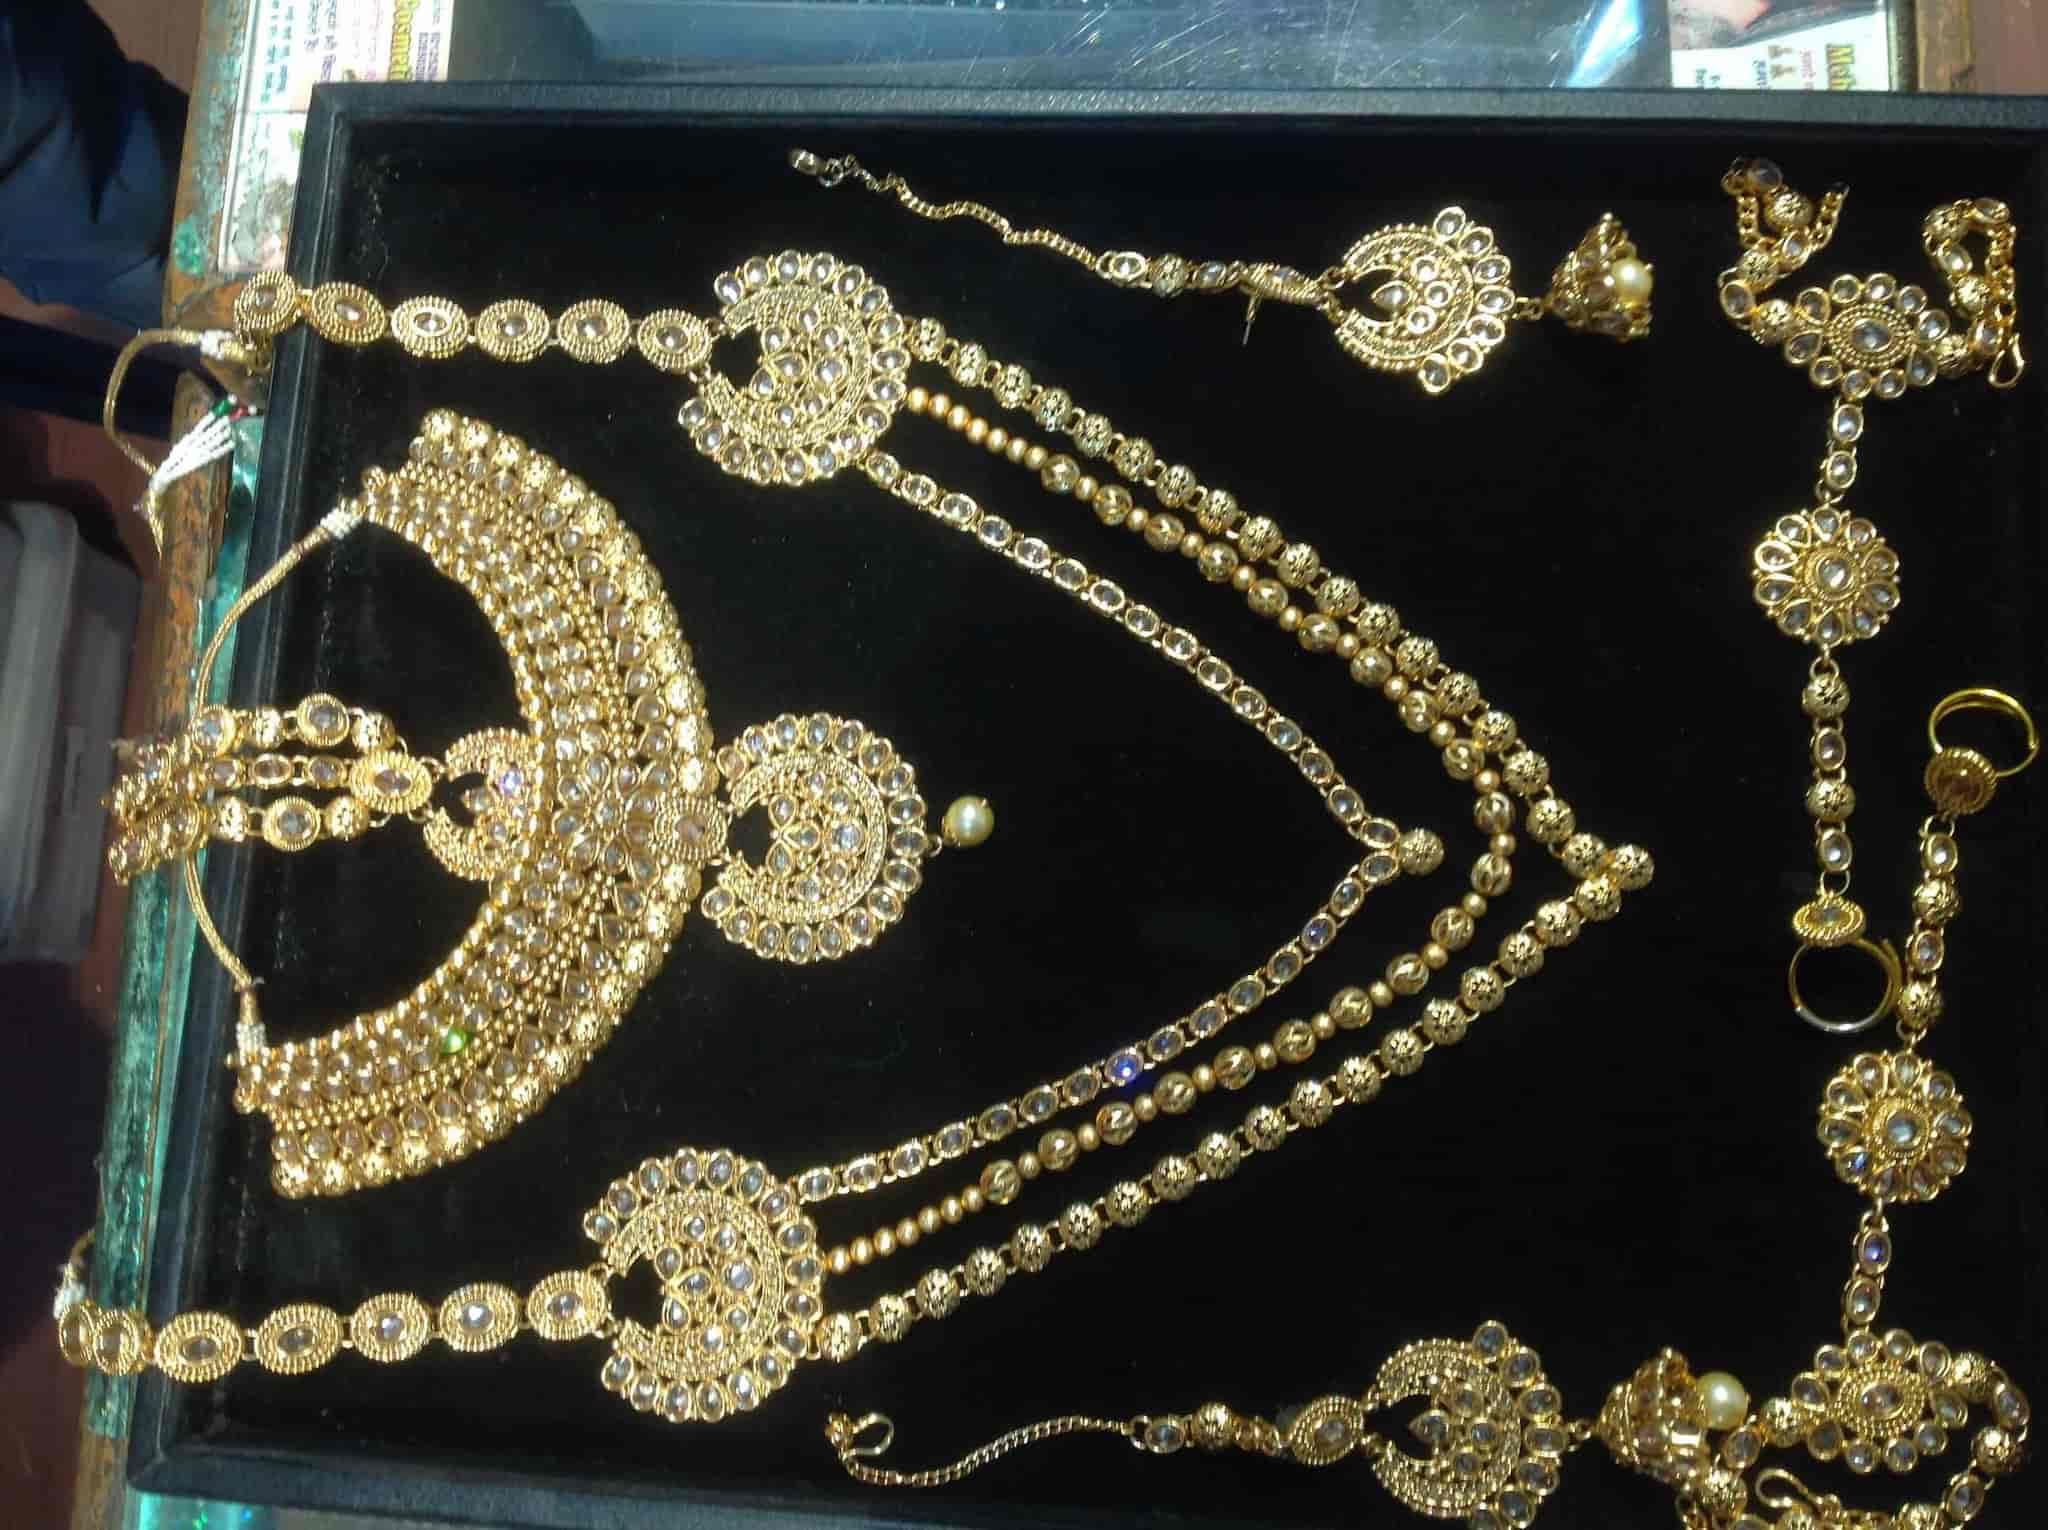 cb95eadc6 ... Bridal Jewellery - Mehak Cosmetics   Artificial Jewellery Shop Photos